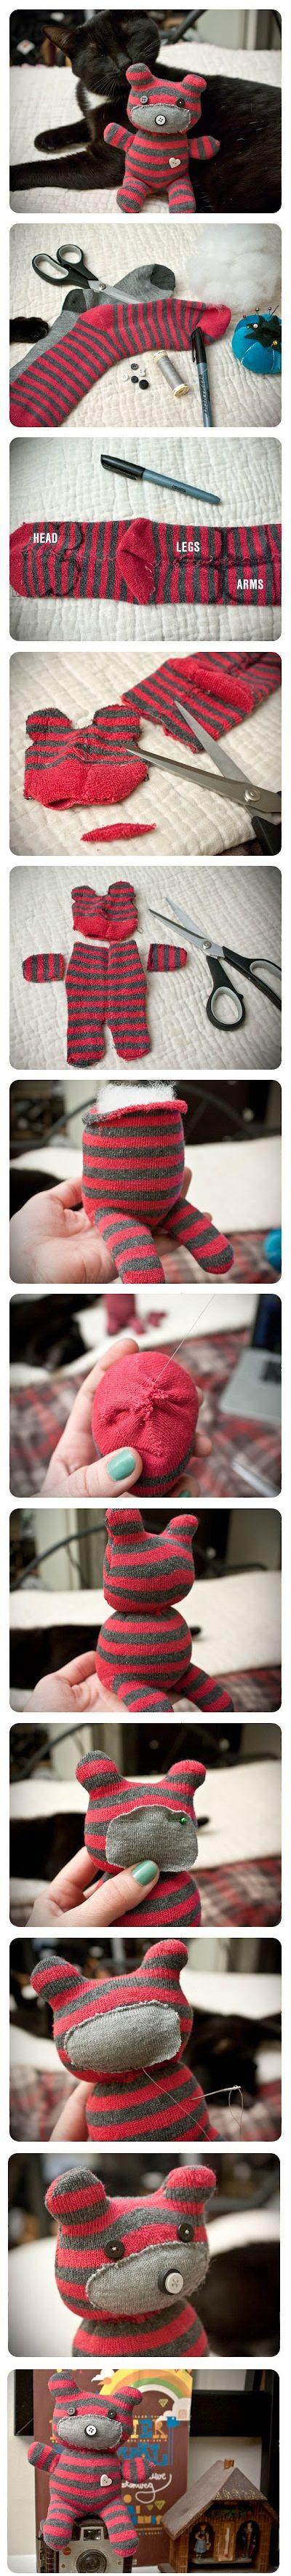 DIY Cute Little Teddy Bear: